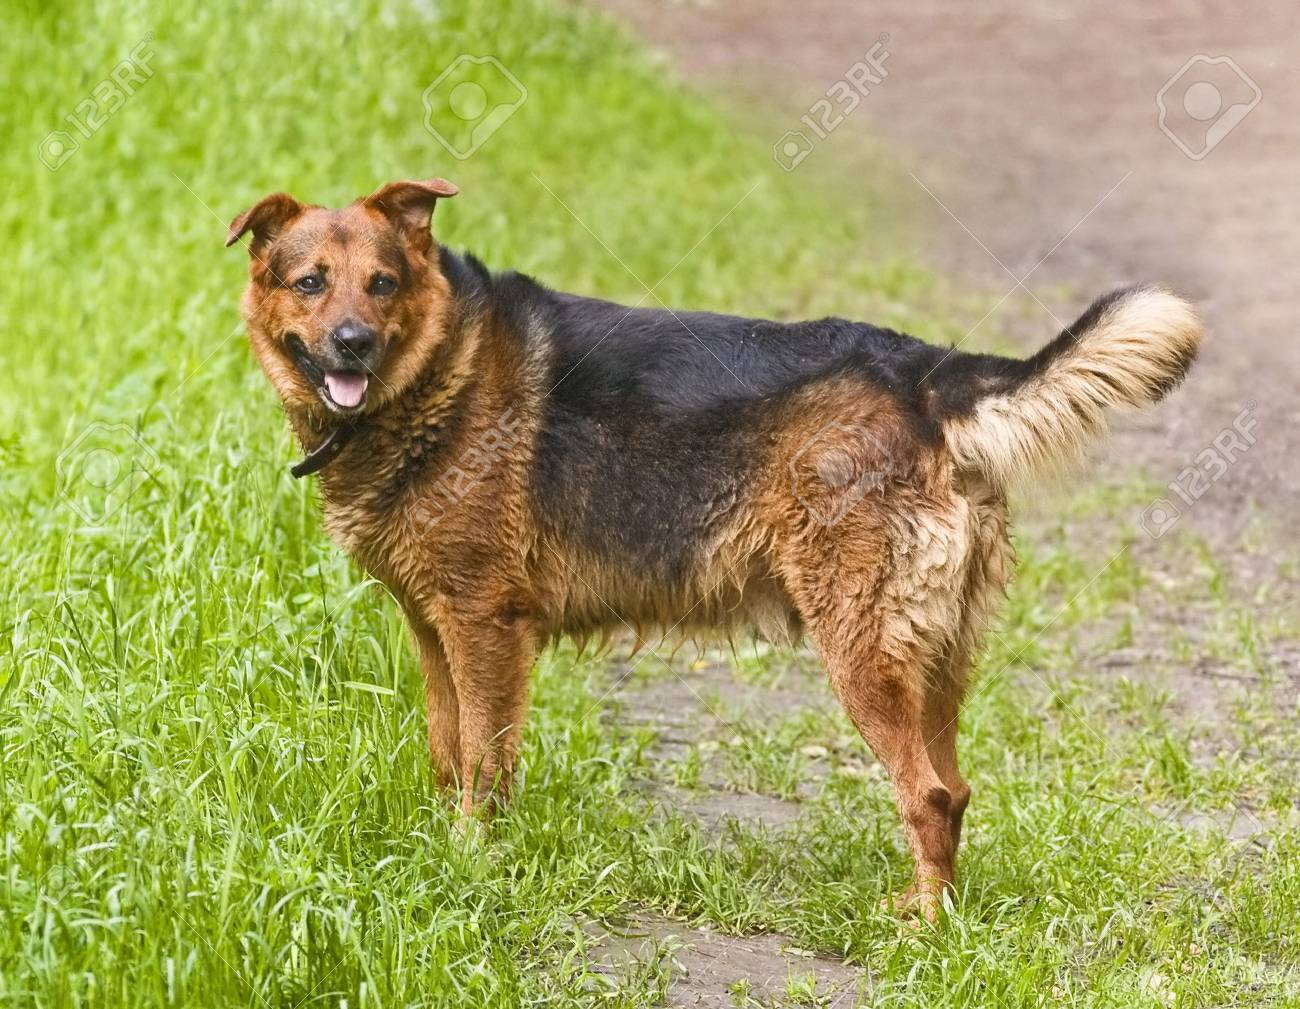 Wet dog on grass Stock Photo - 5076837